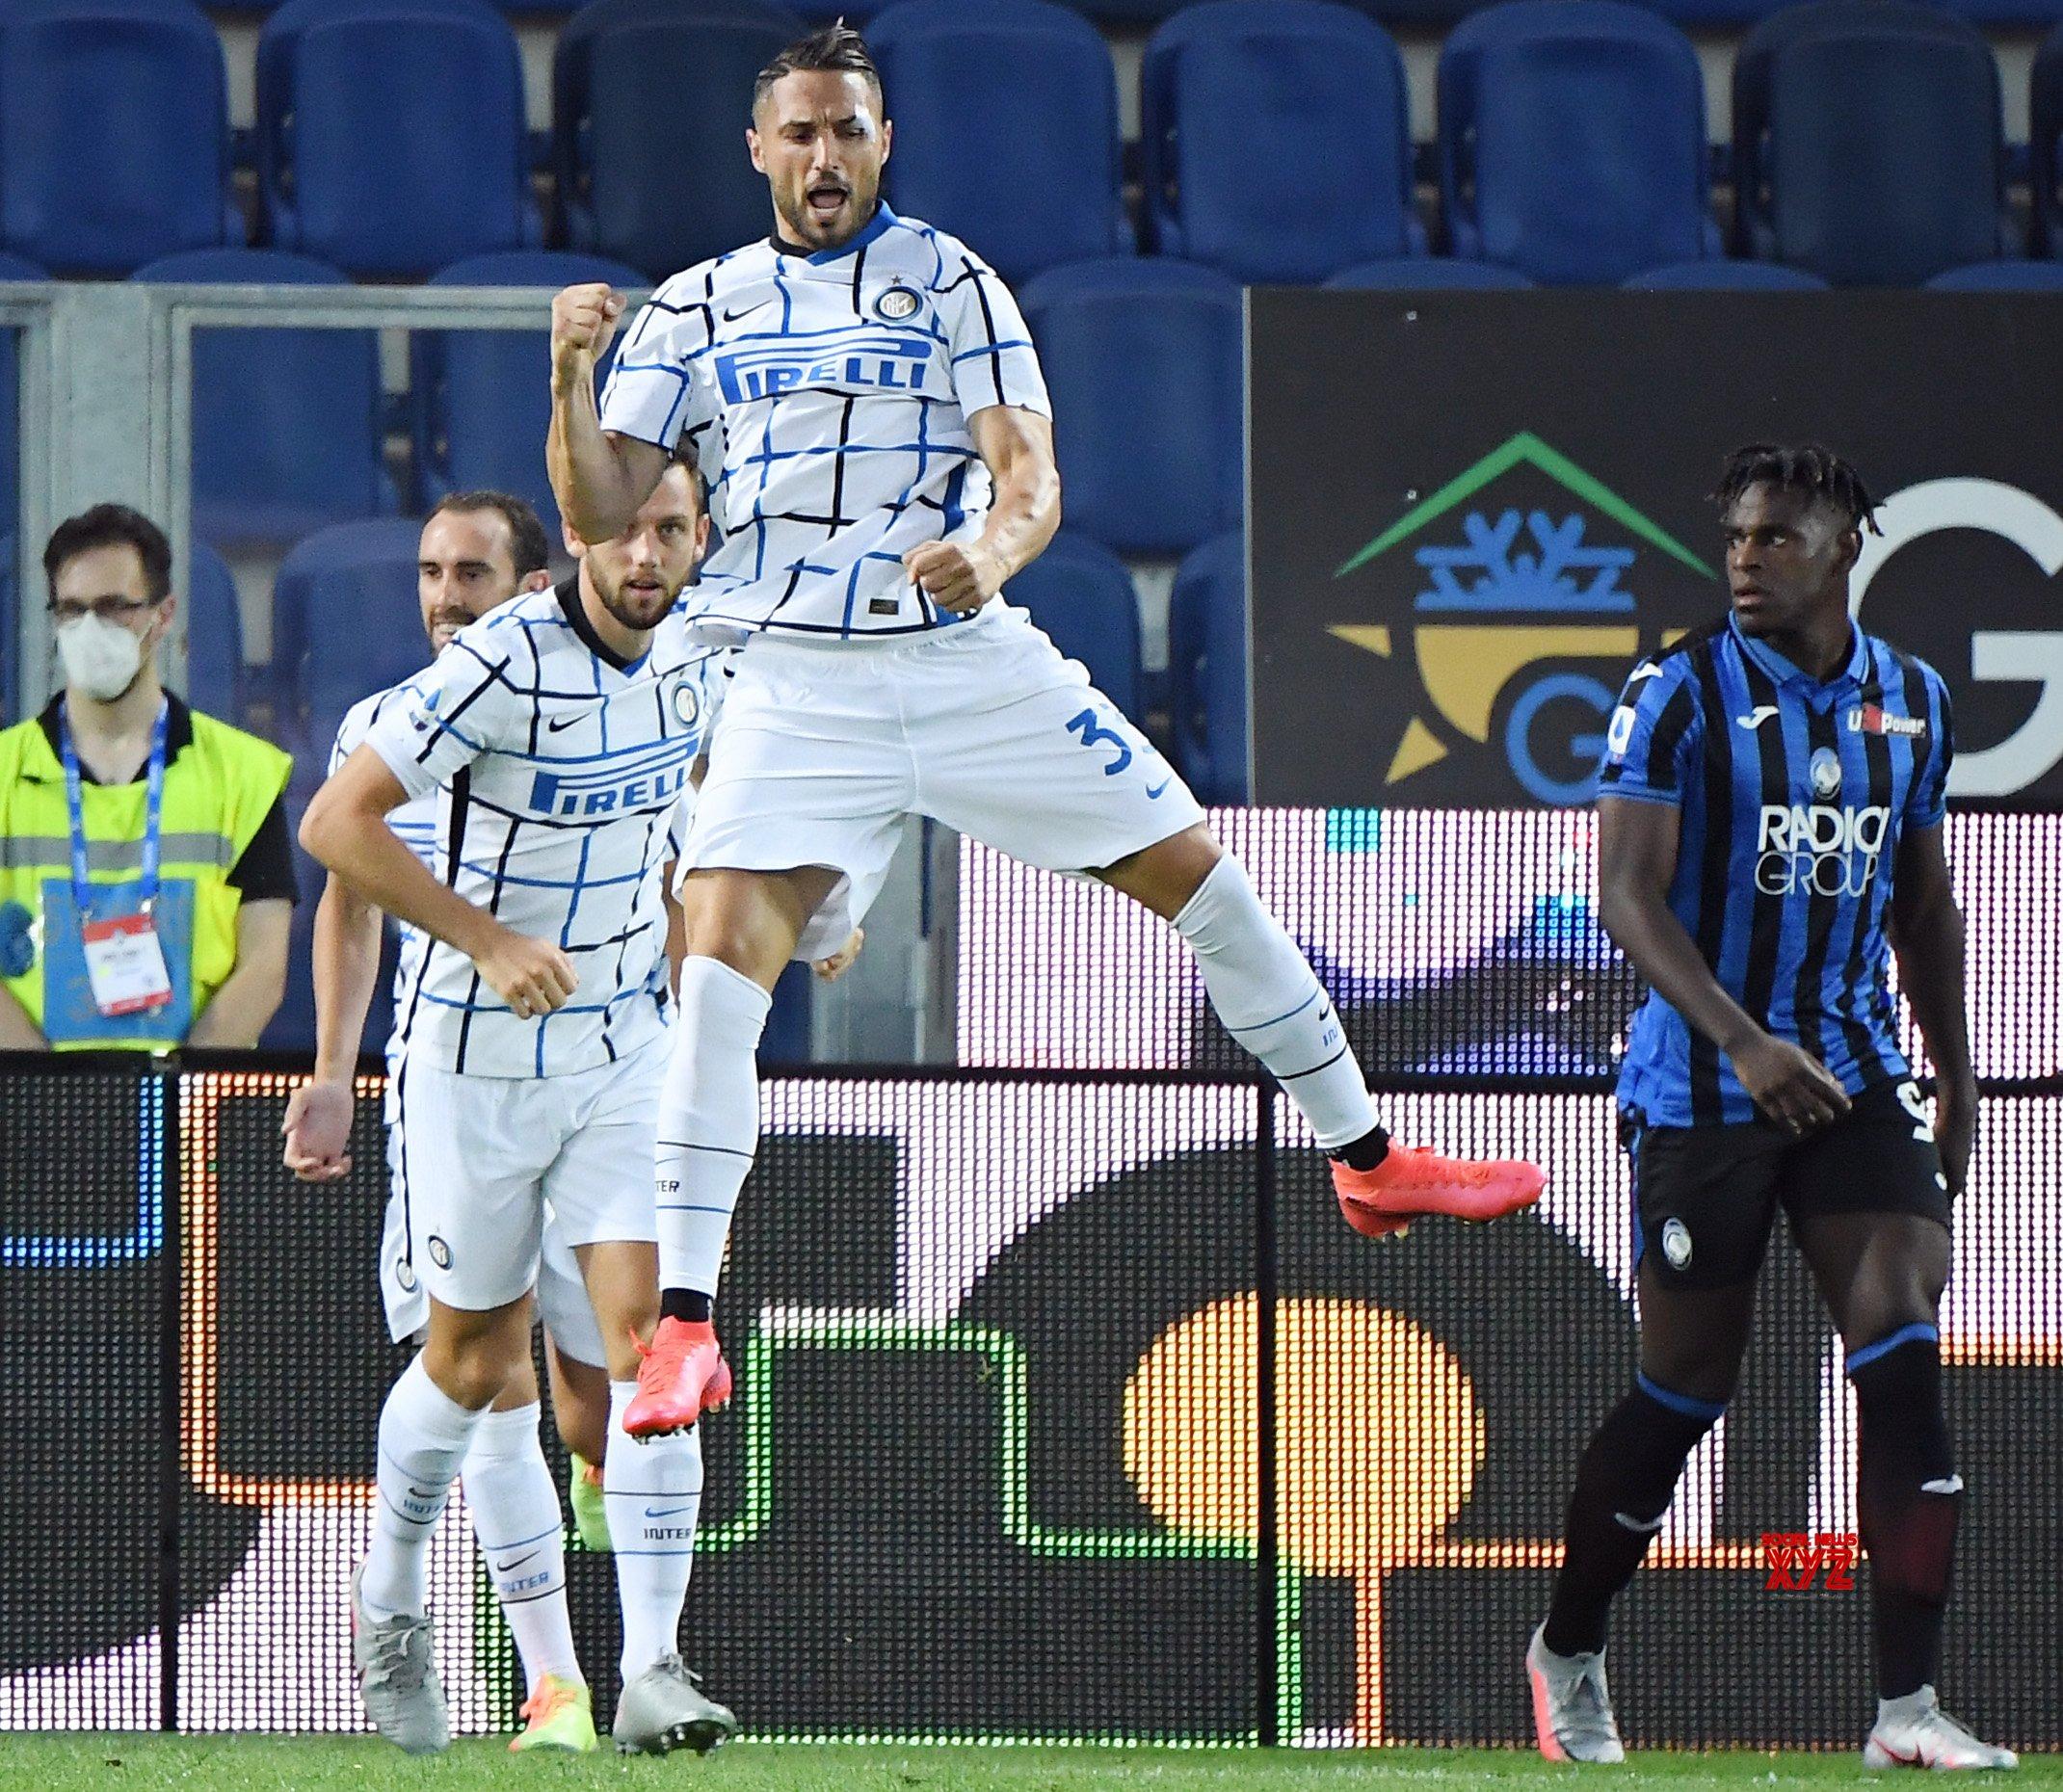 ITALY - BERGAMO - FOOTBALL - SERIE A - ATLANTA VS FC INTER #Gallery